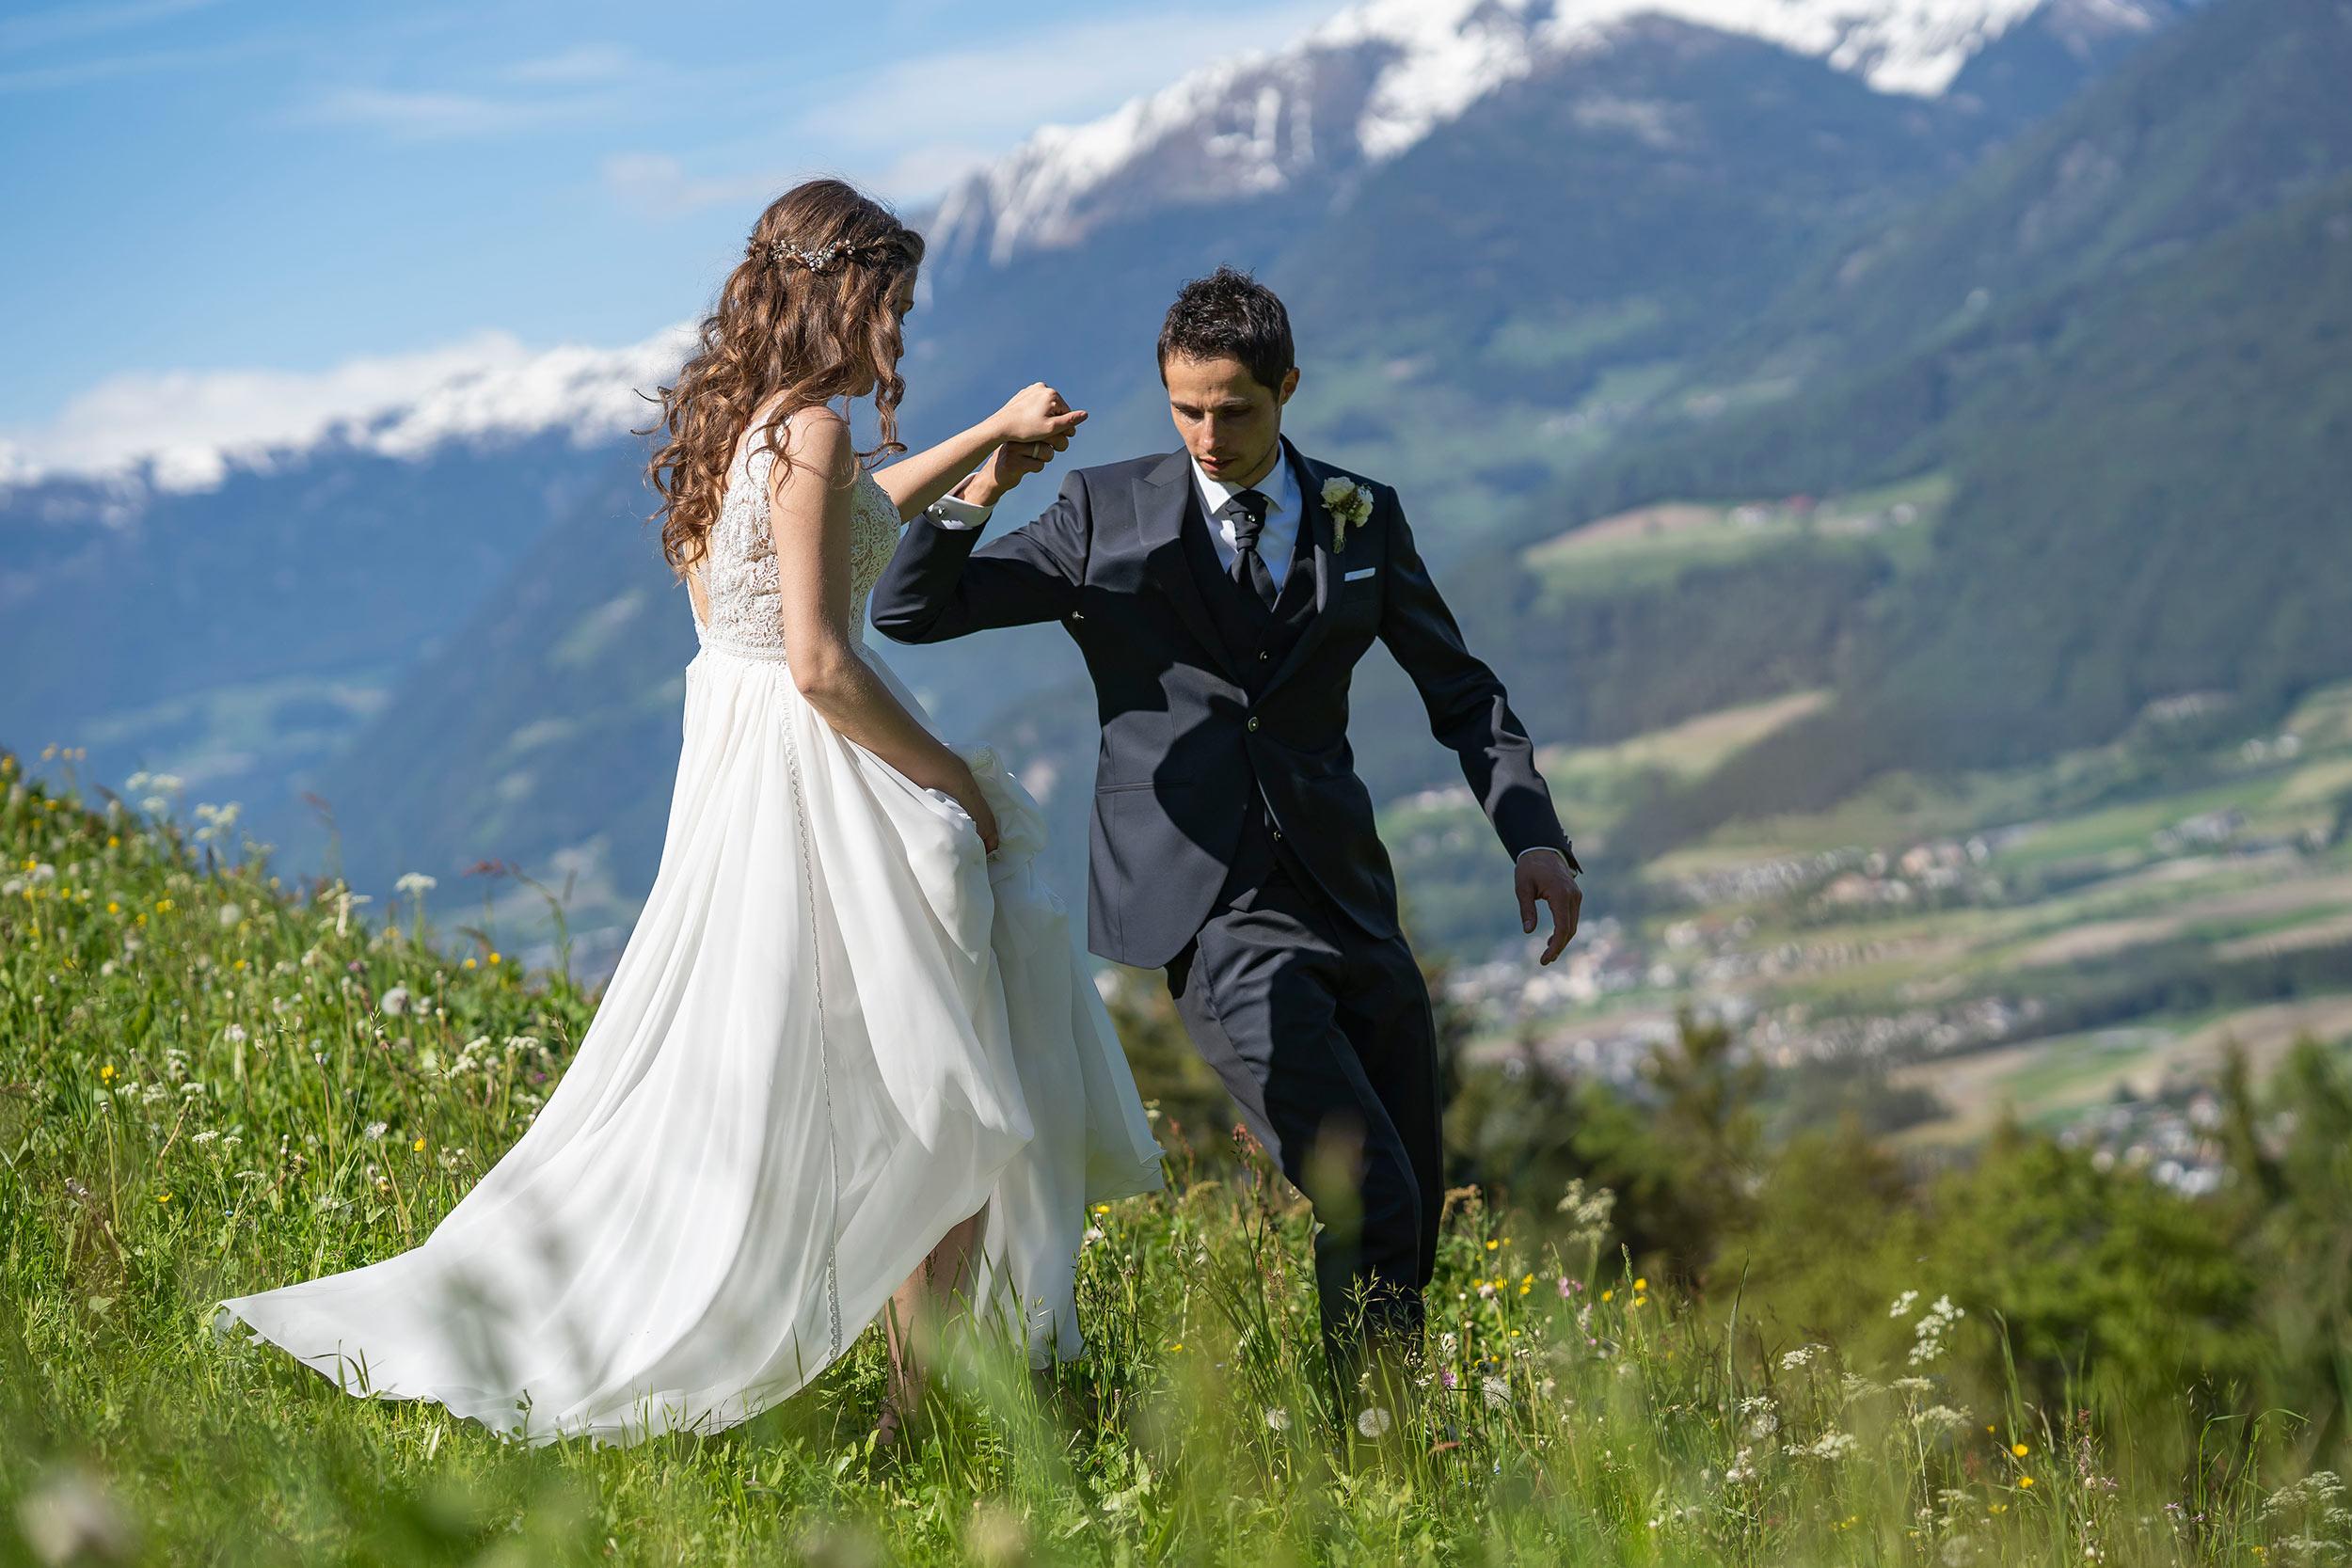 Evi_&_Christian_Hochzeit_01-06-2019_416